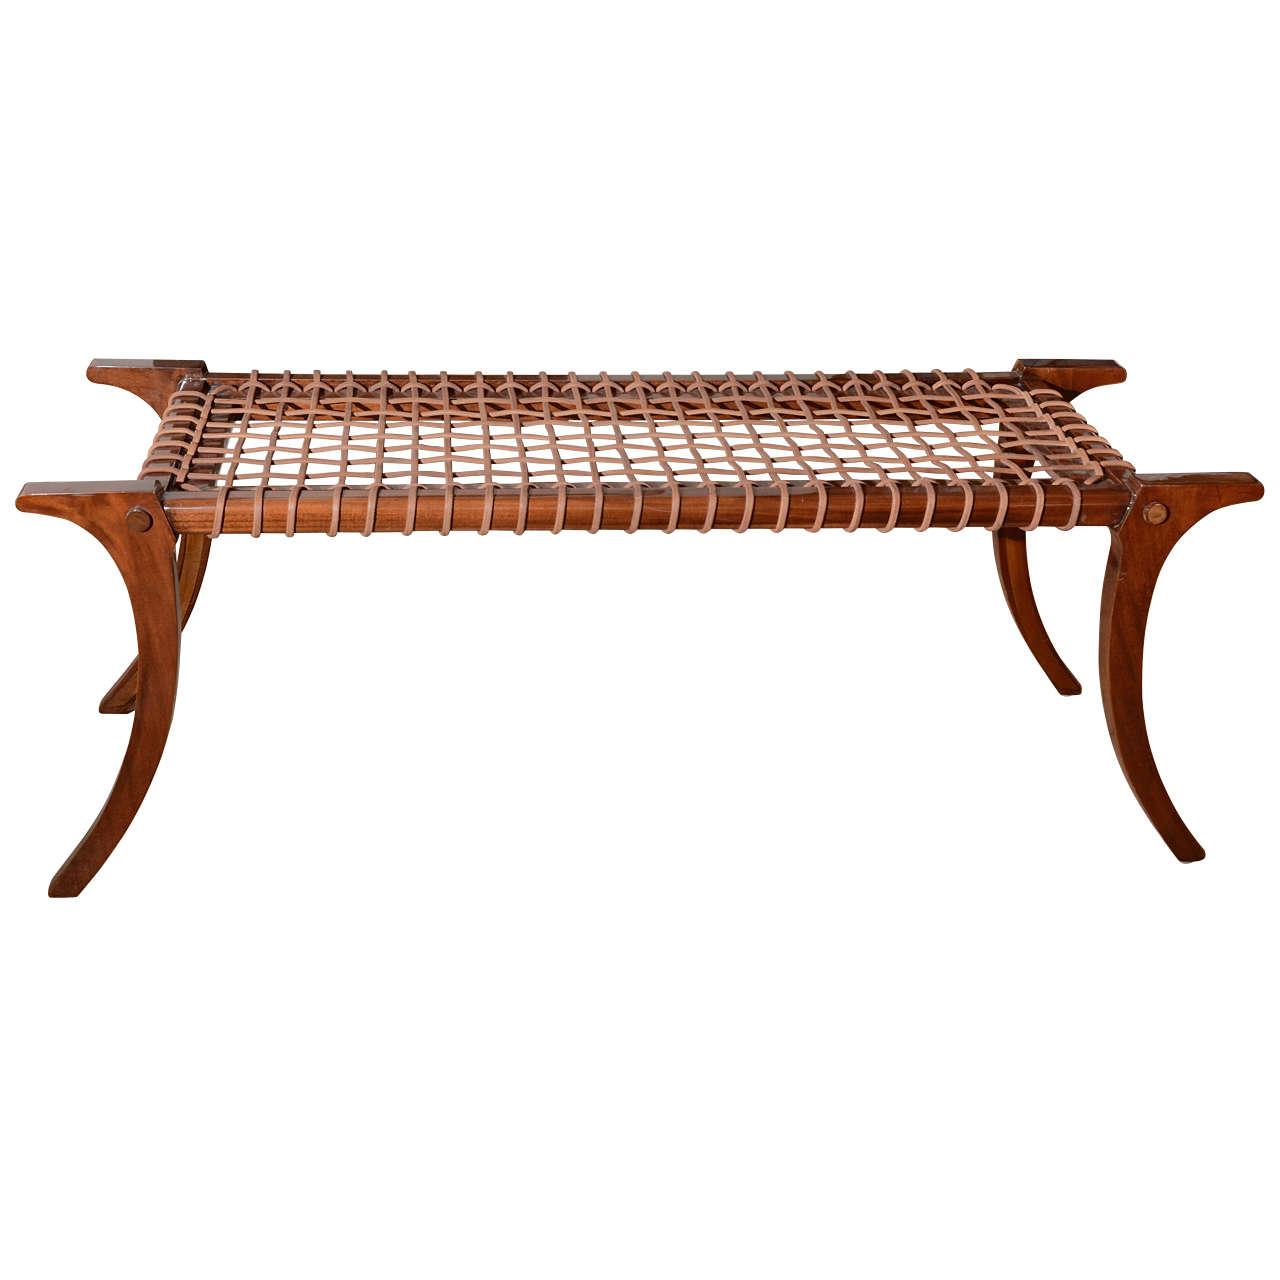 klismos leg bench ~ klismos bench in solid mahagony at 1stdibs